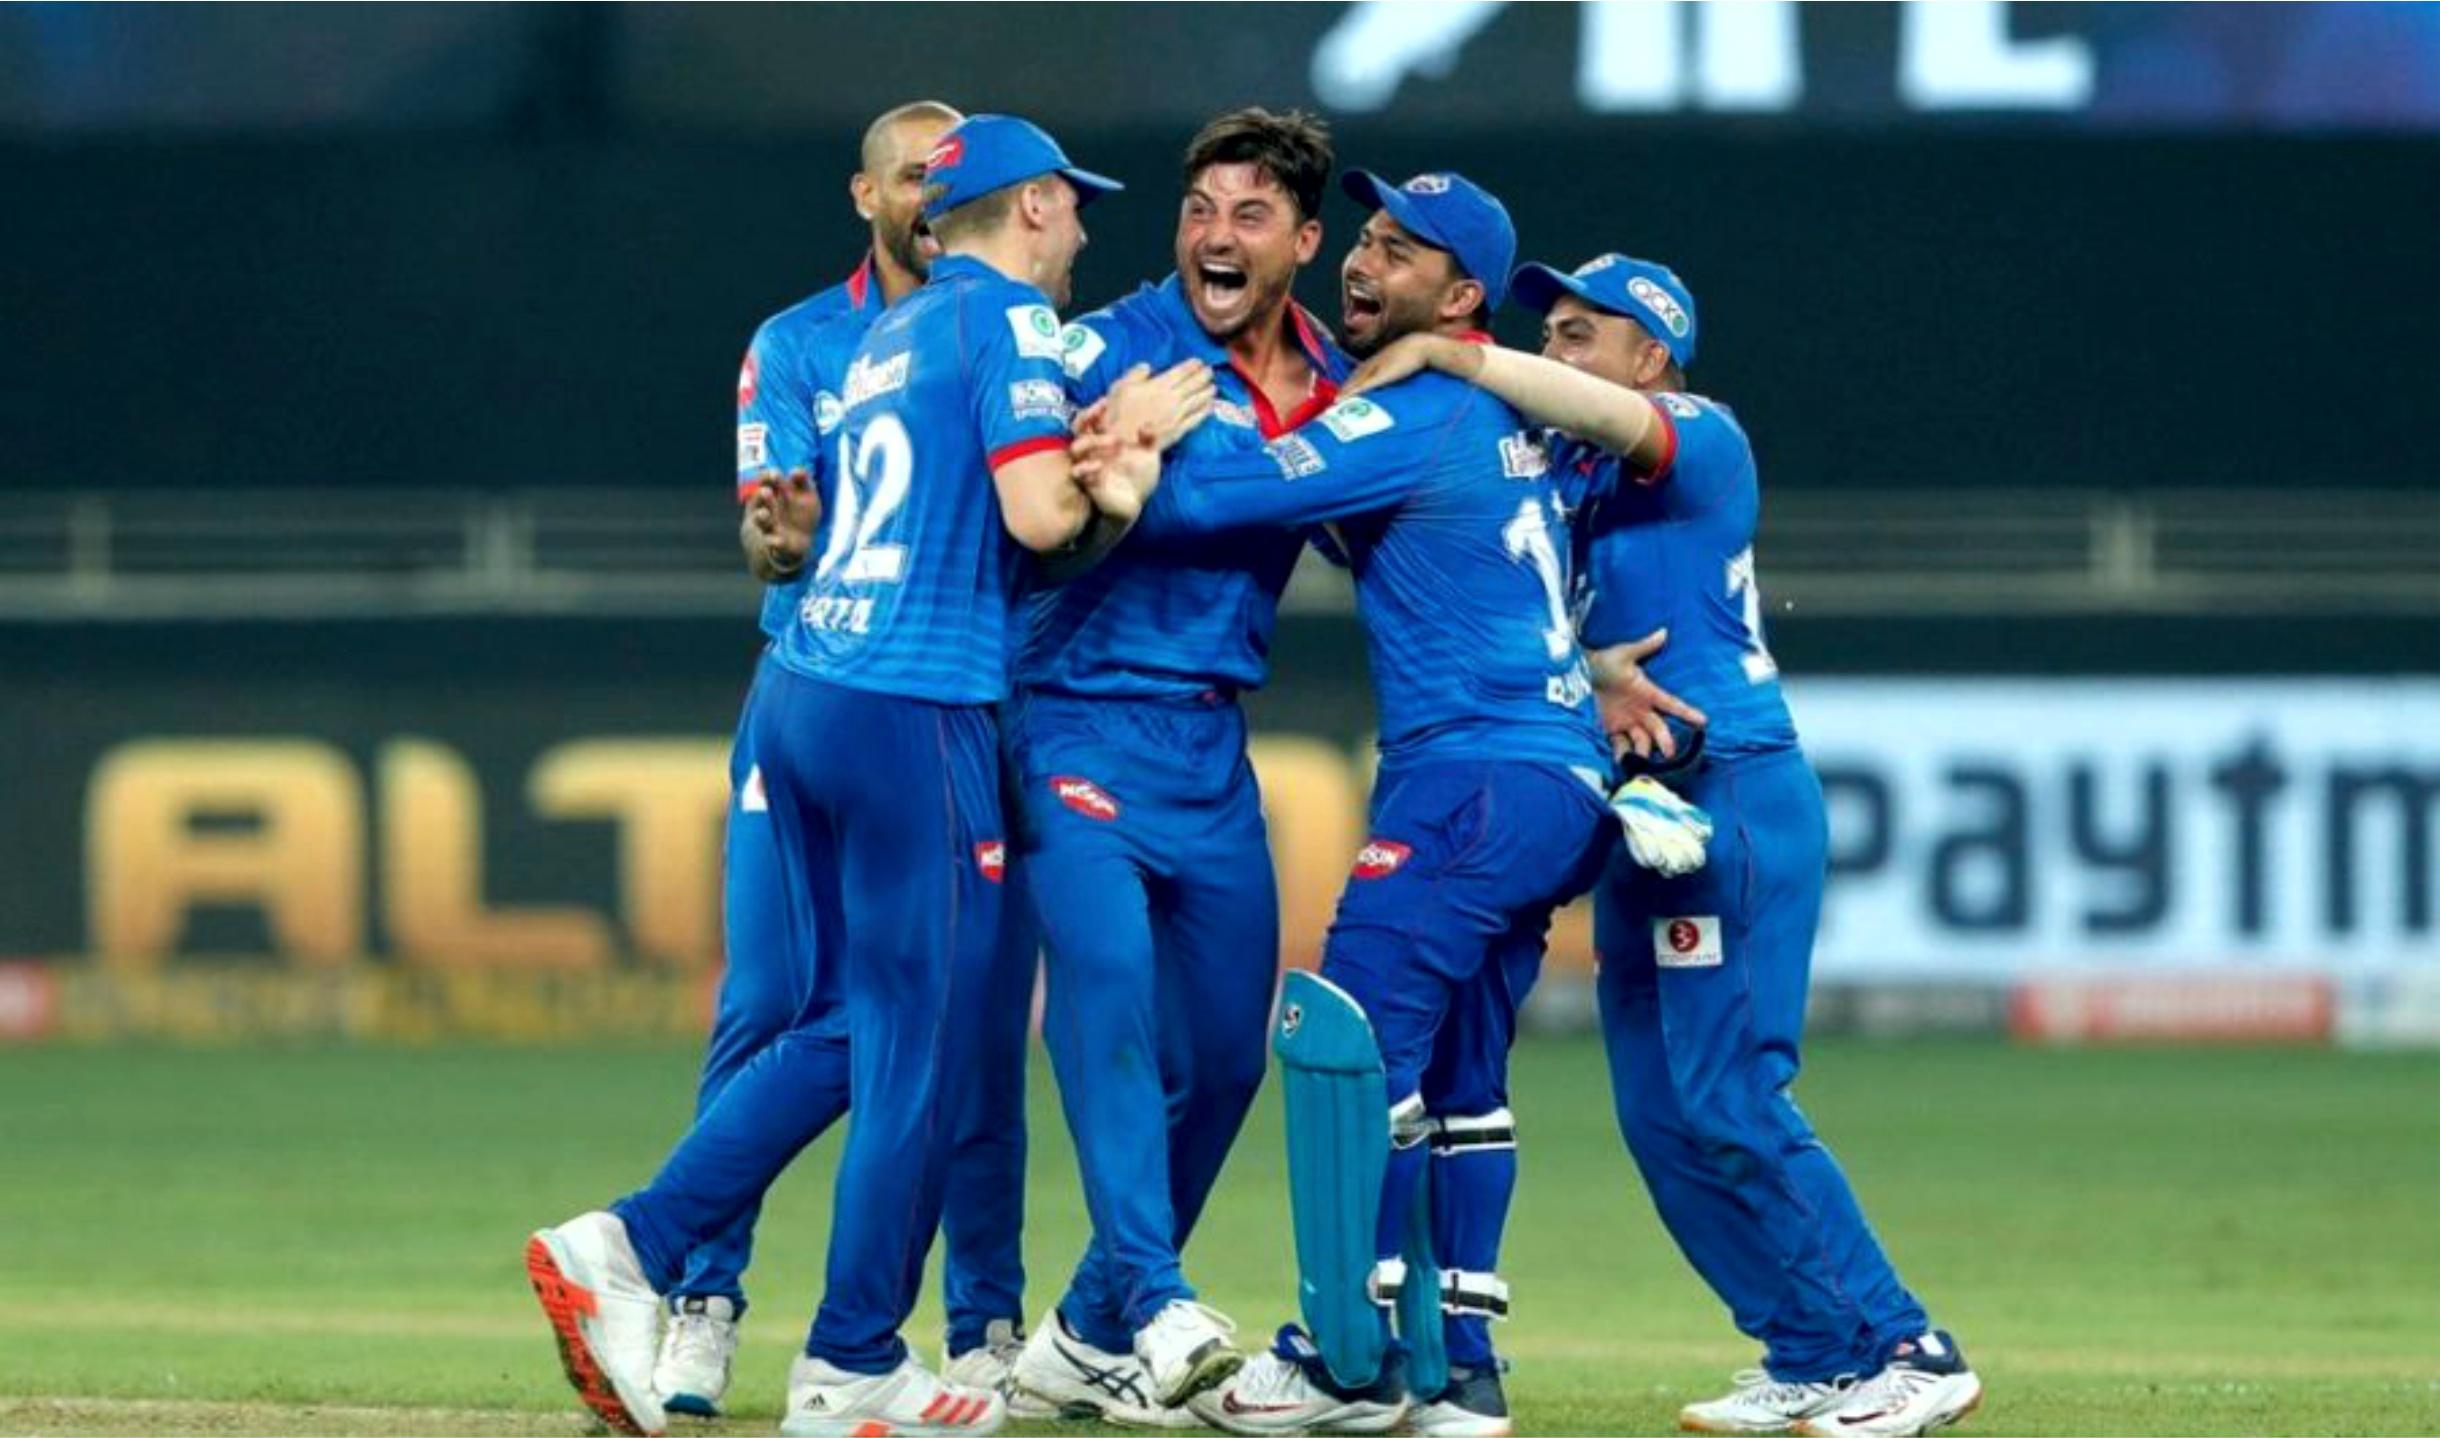 आईपीएल : सन्दिप सम्मिलित दिल्लीको विजयी सुरुवात